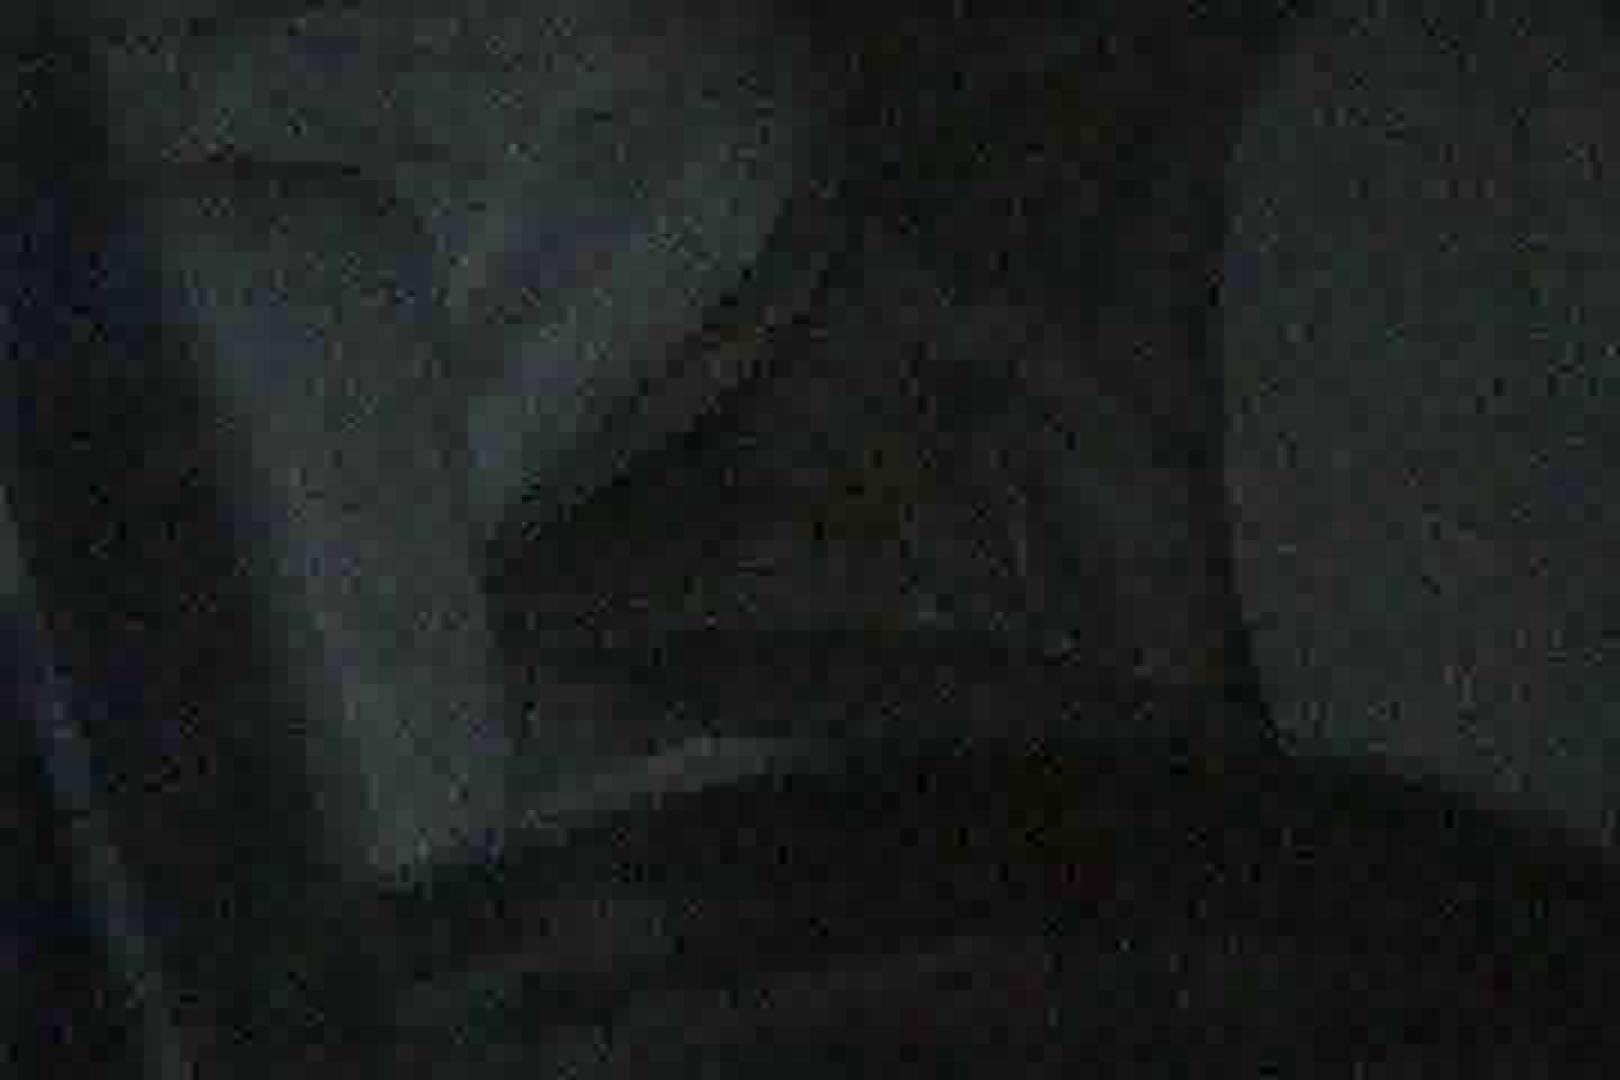 充血監督の深夜の運動会Vol.28 美乳 エロ画像 54連発 22